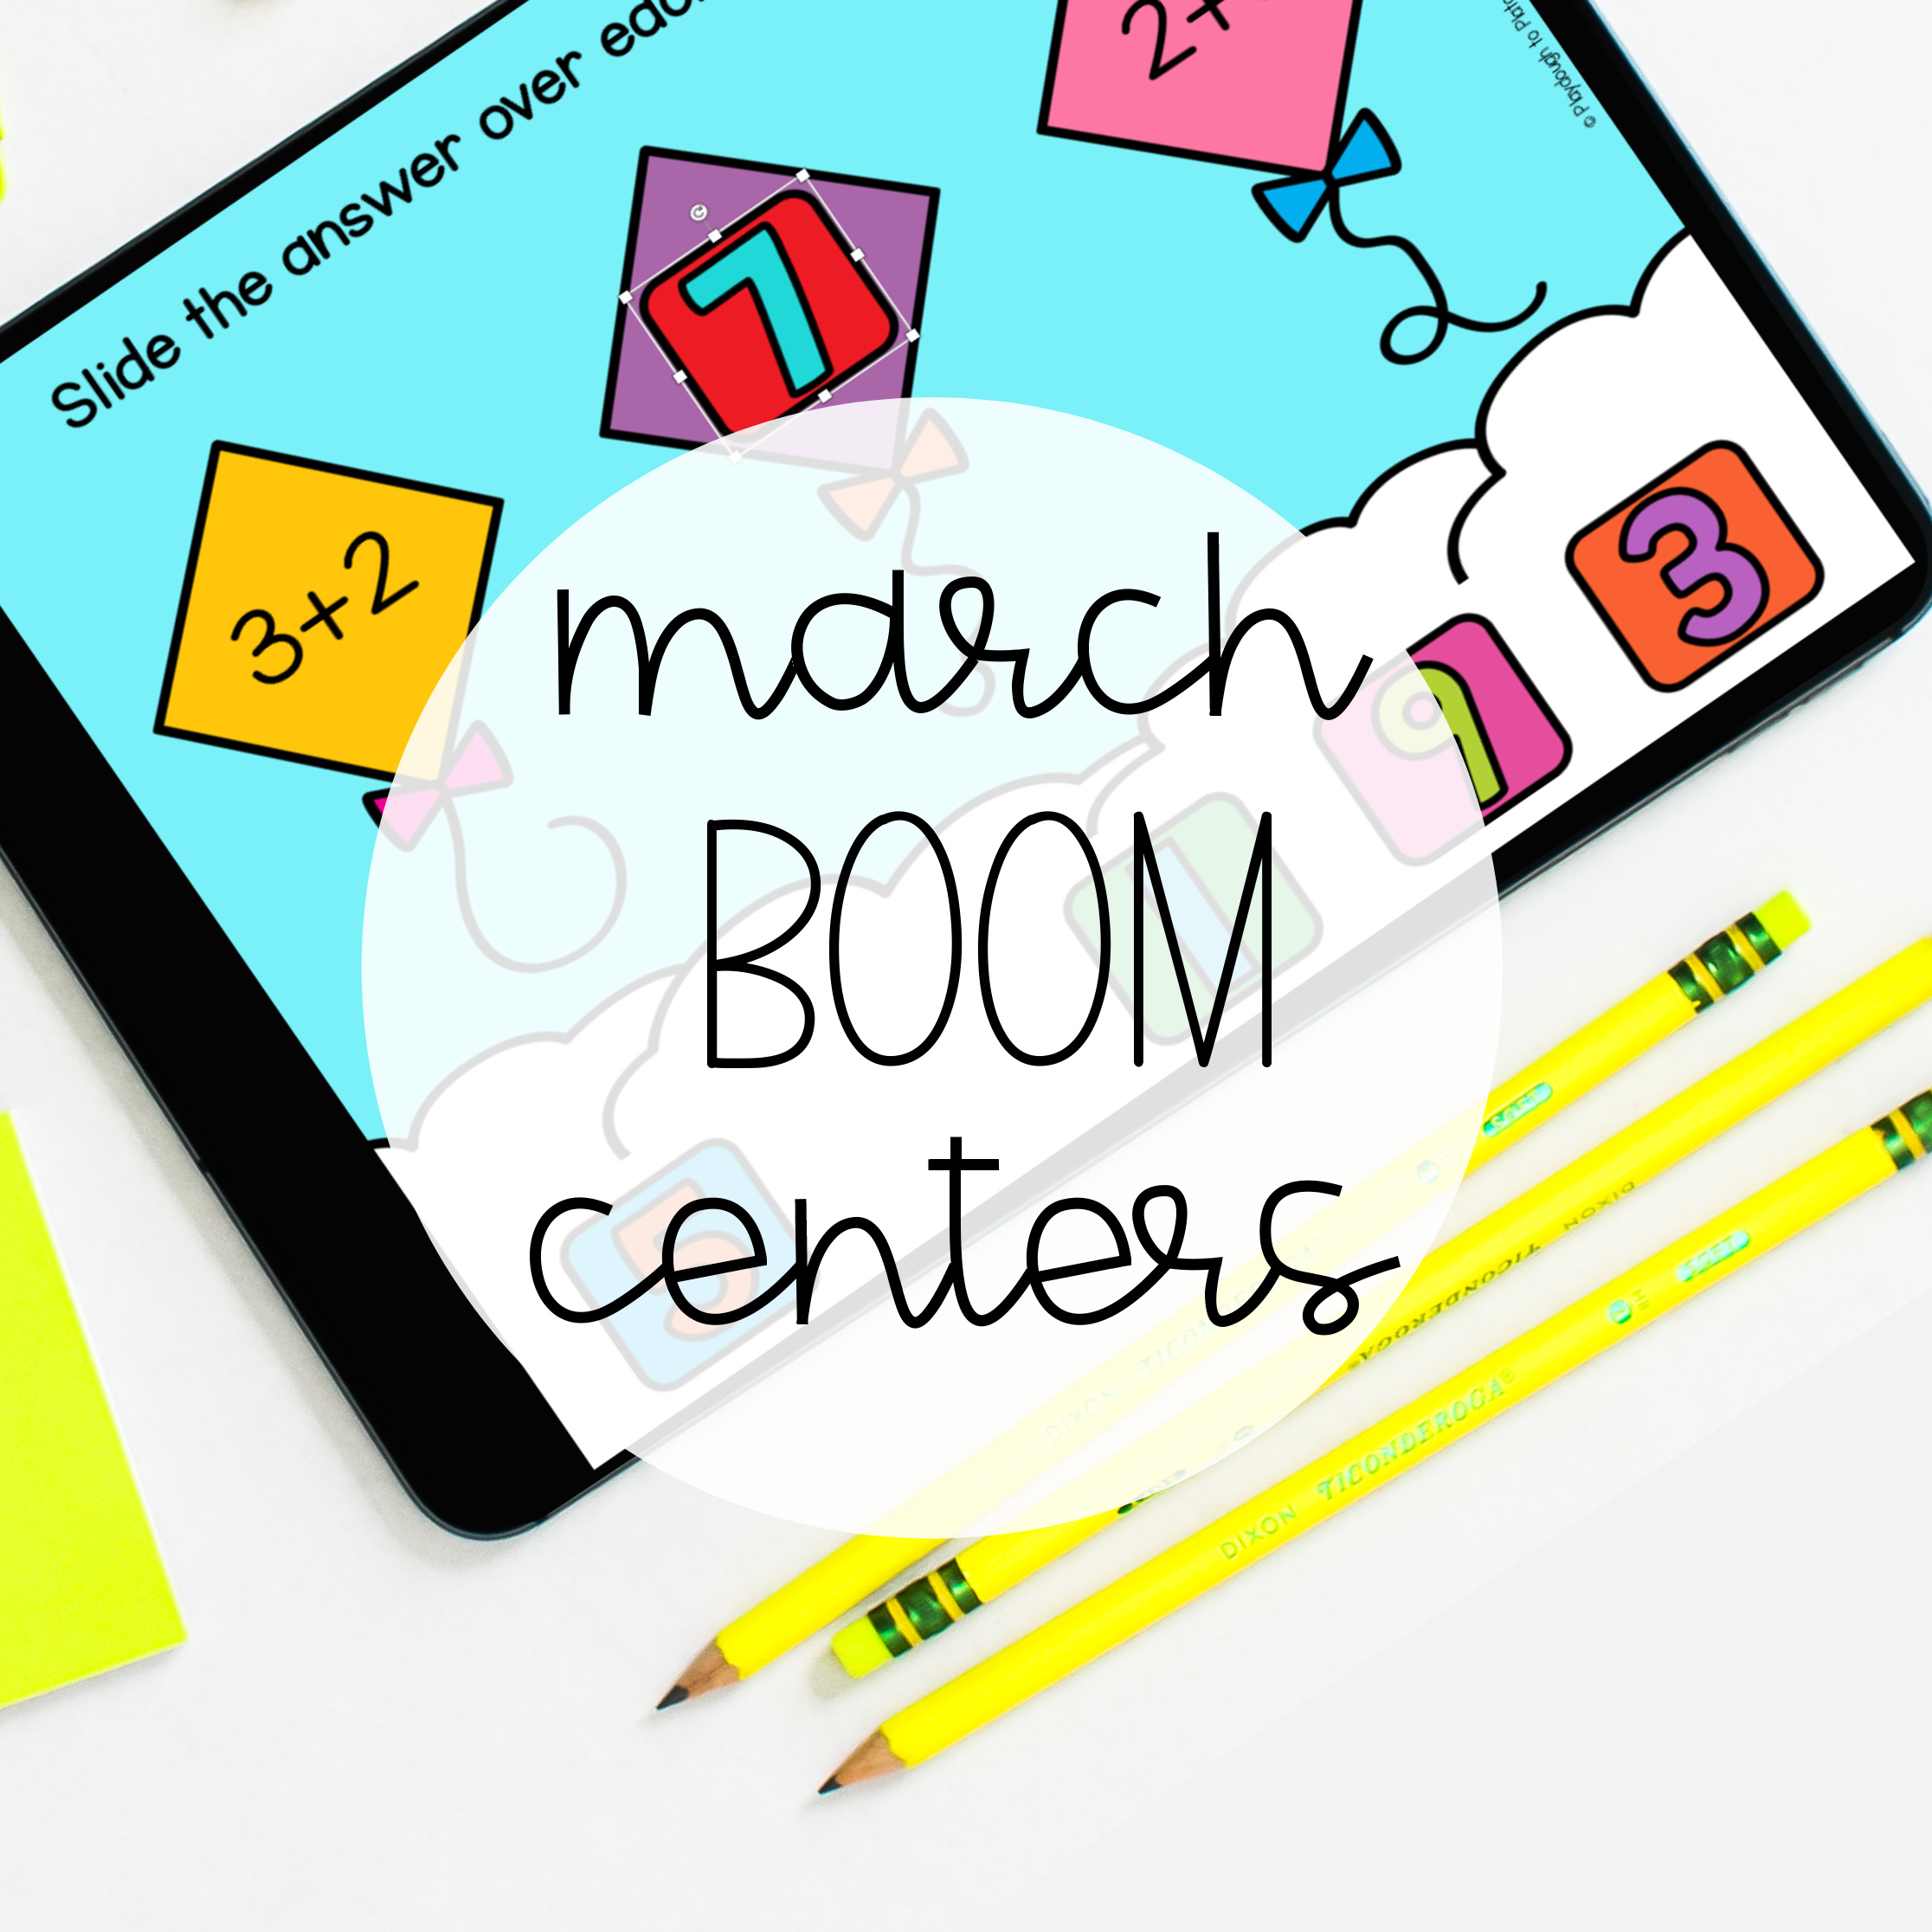 Boom March Centers